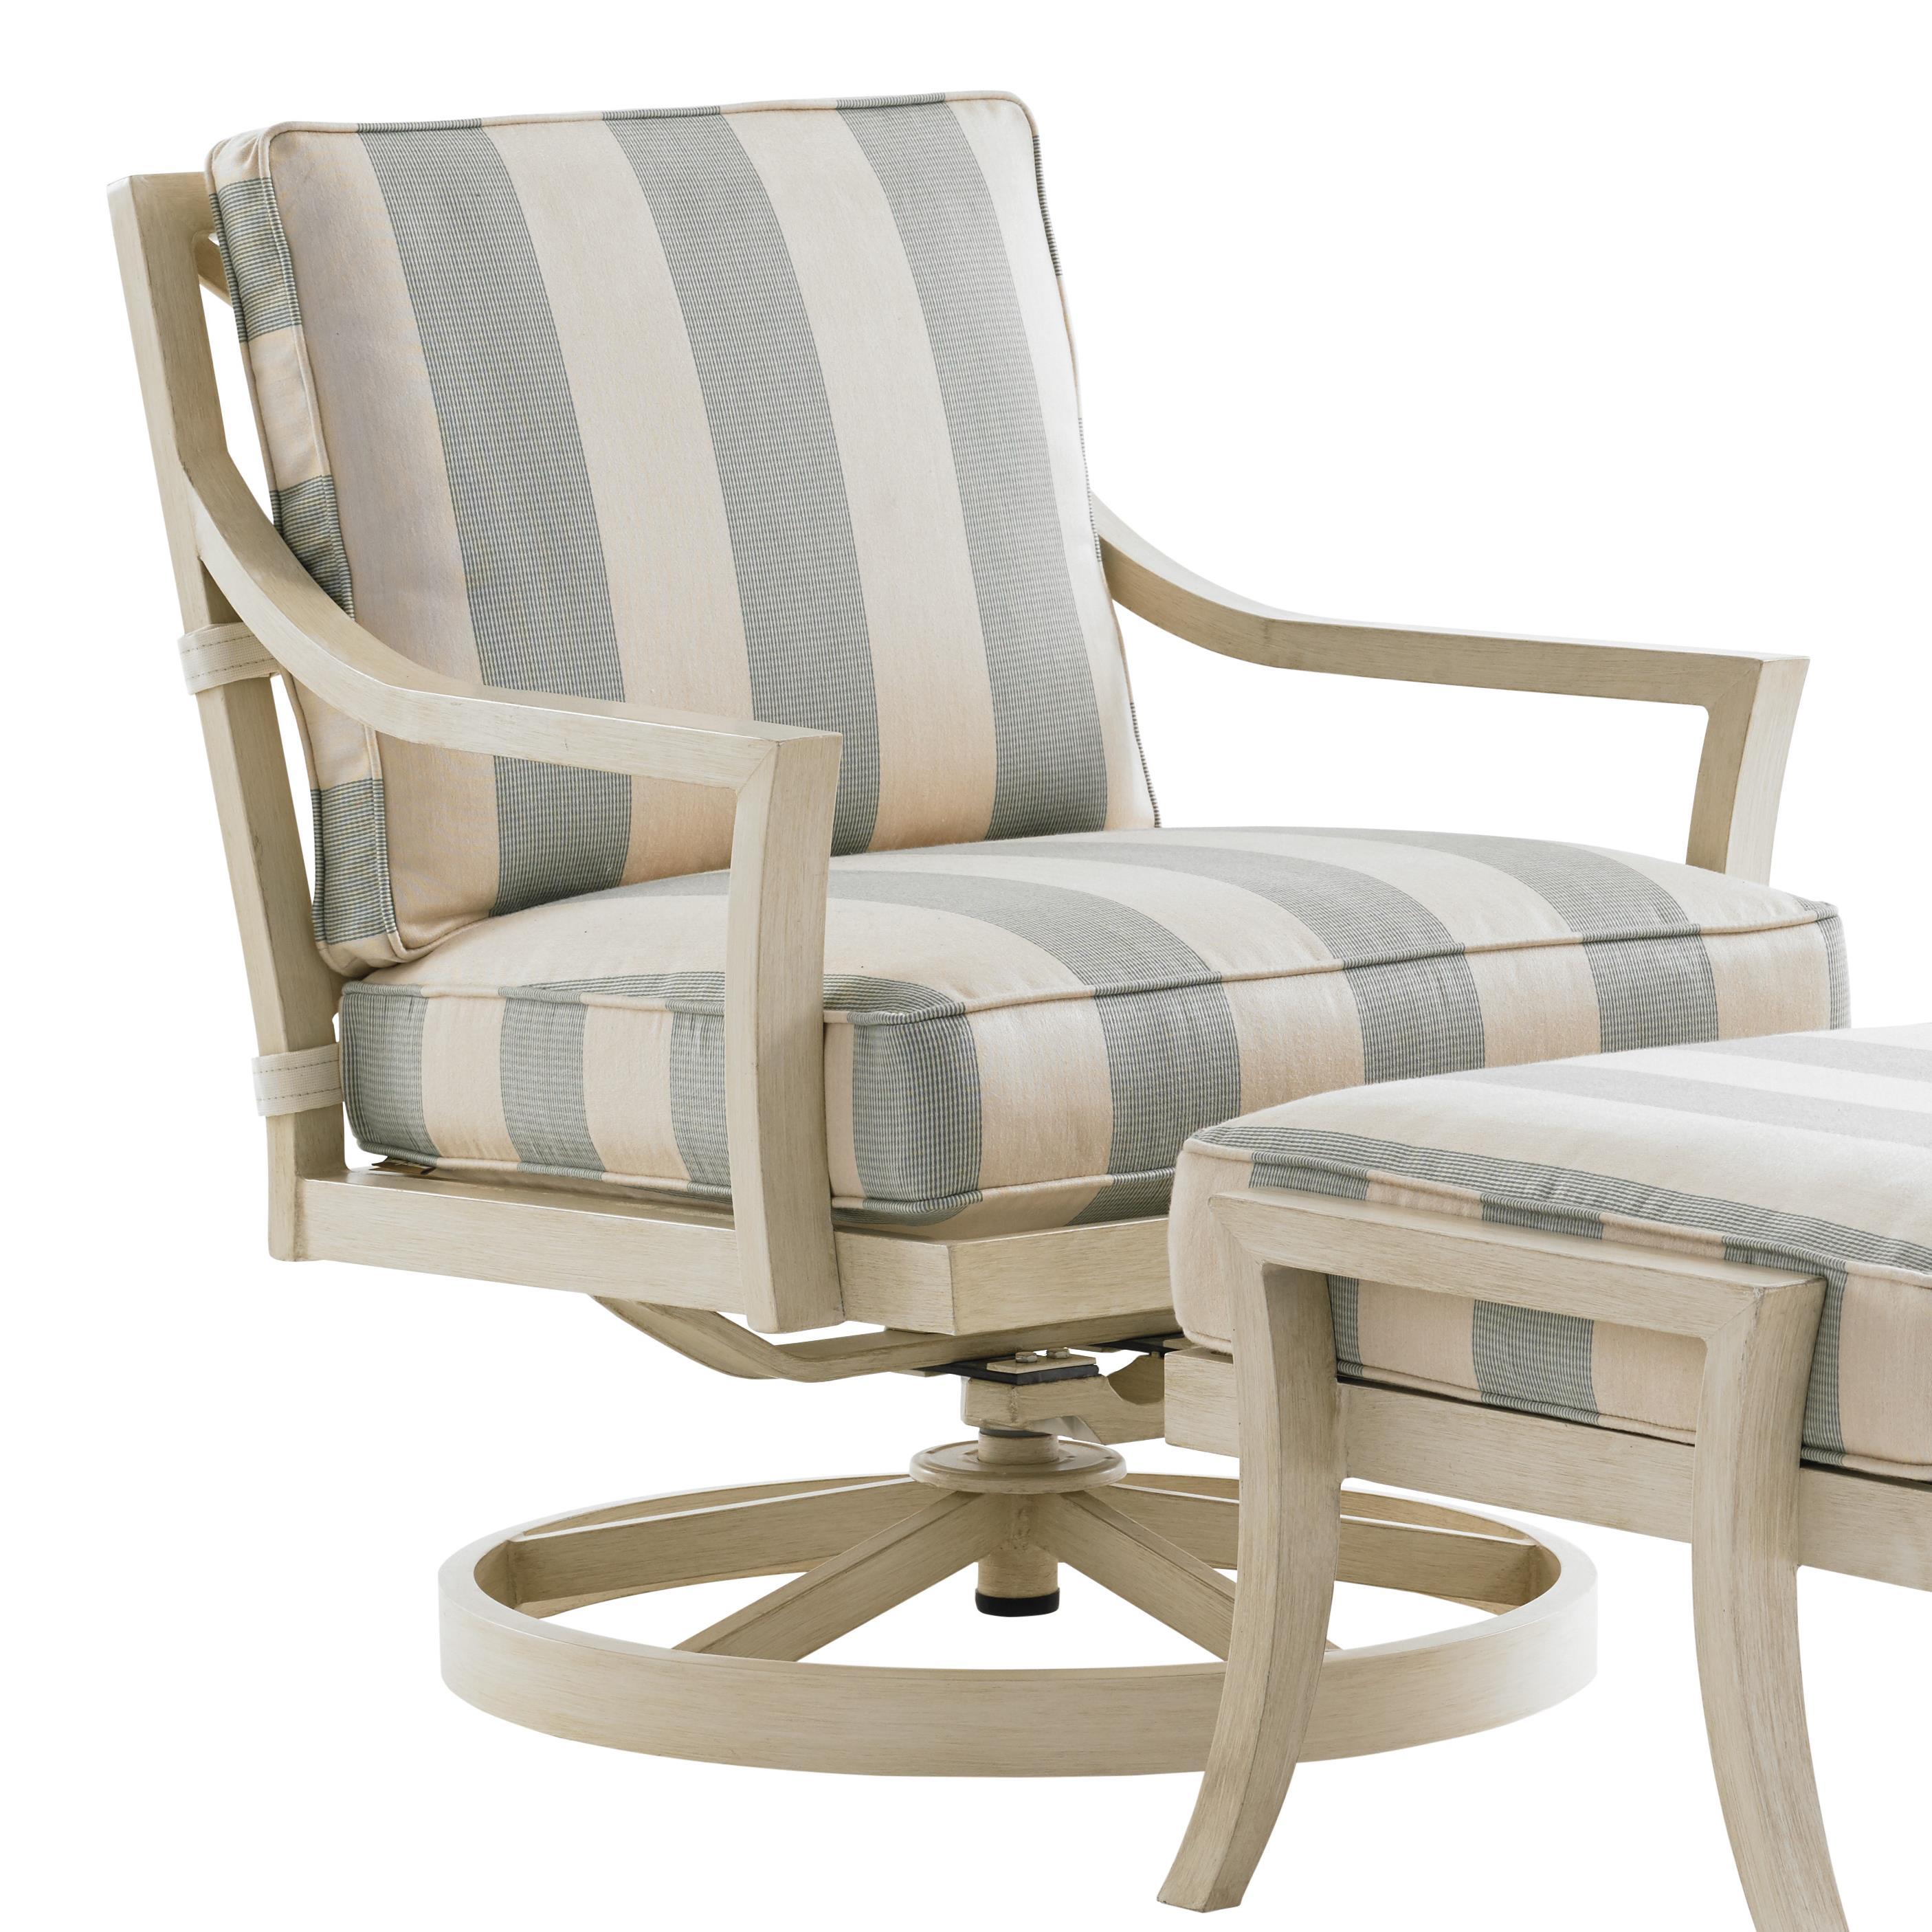 Tommy Bahama Outdoor Living Misty GardenSwivel Rocker Lounge Chair ...